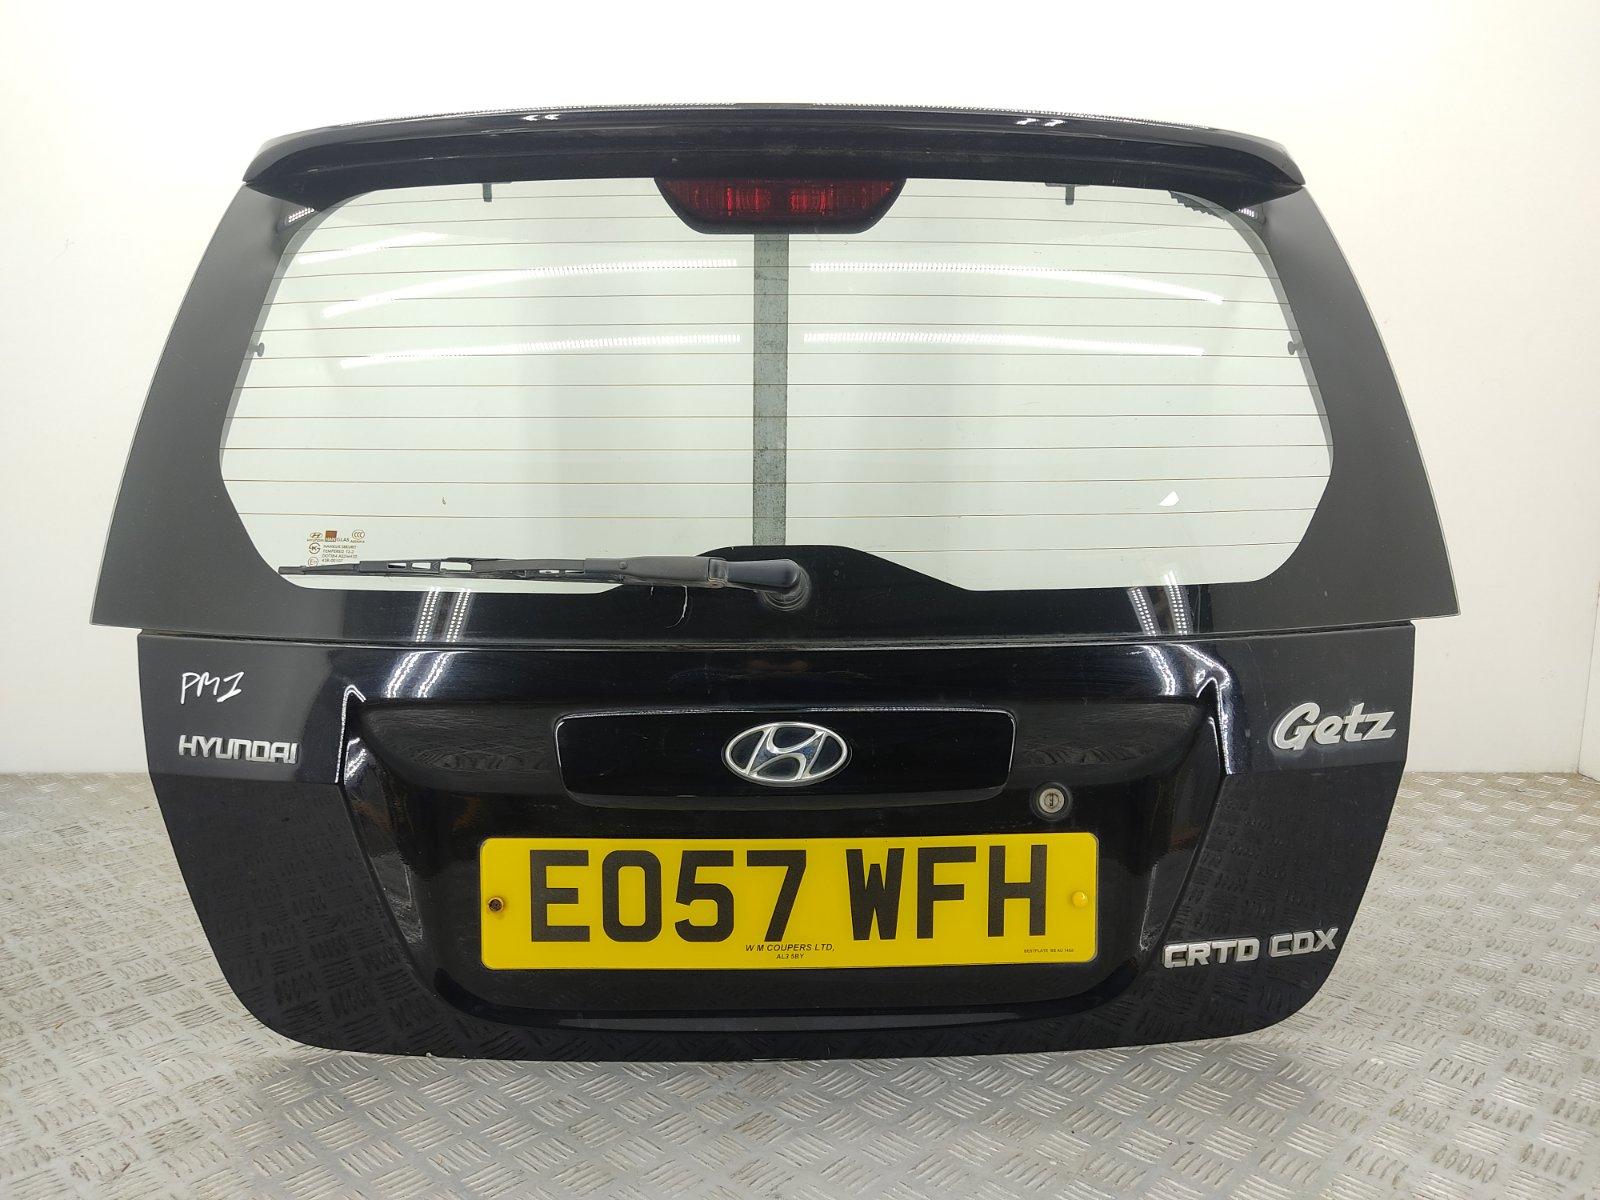 Крышка багажника Hyundai Getz 1.5 CRDI 2007 (б/у)